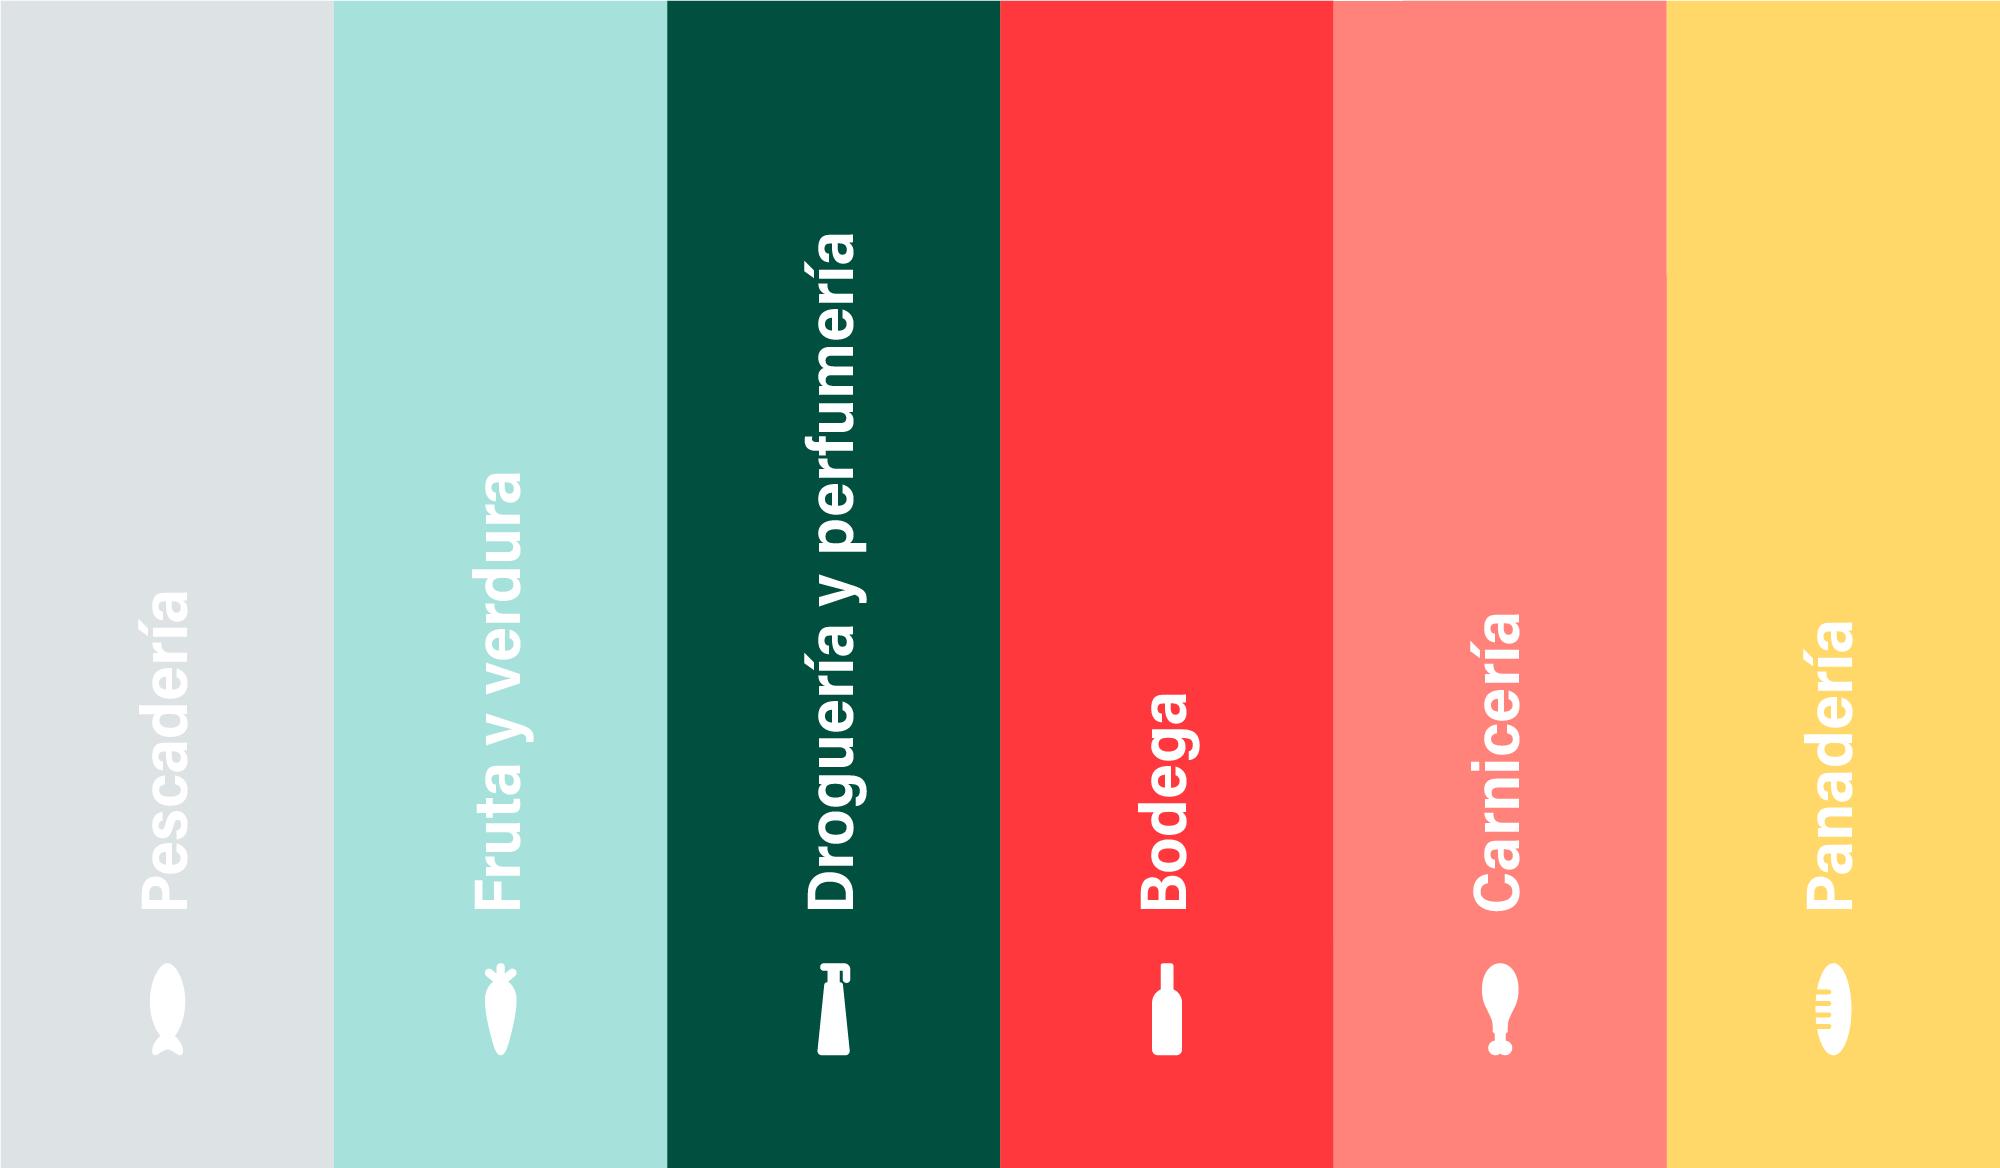 superdumbo-branding-08